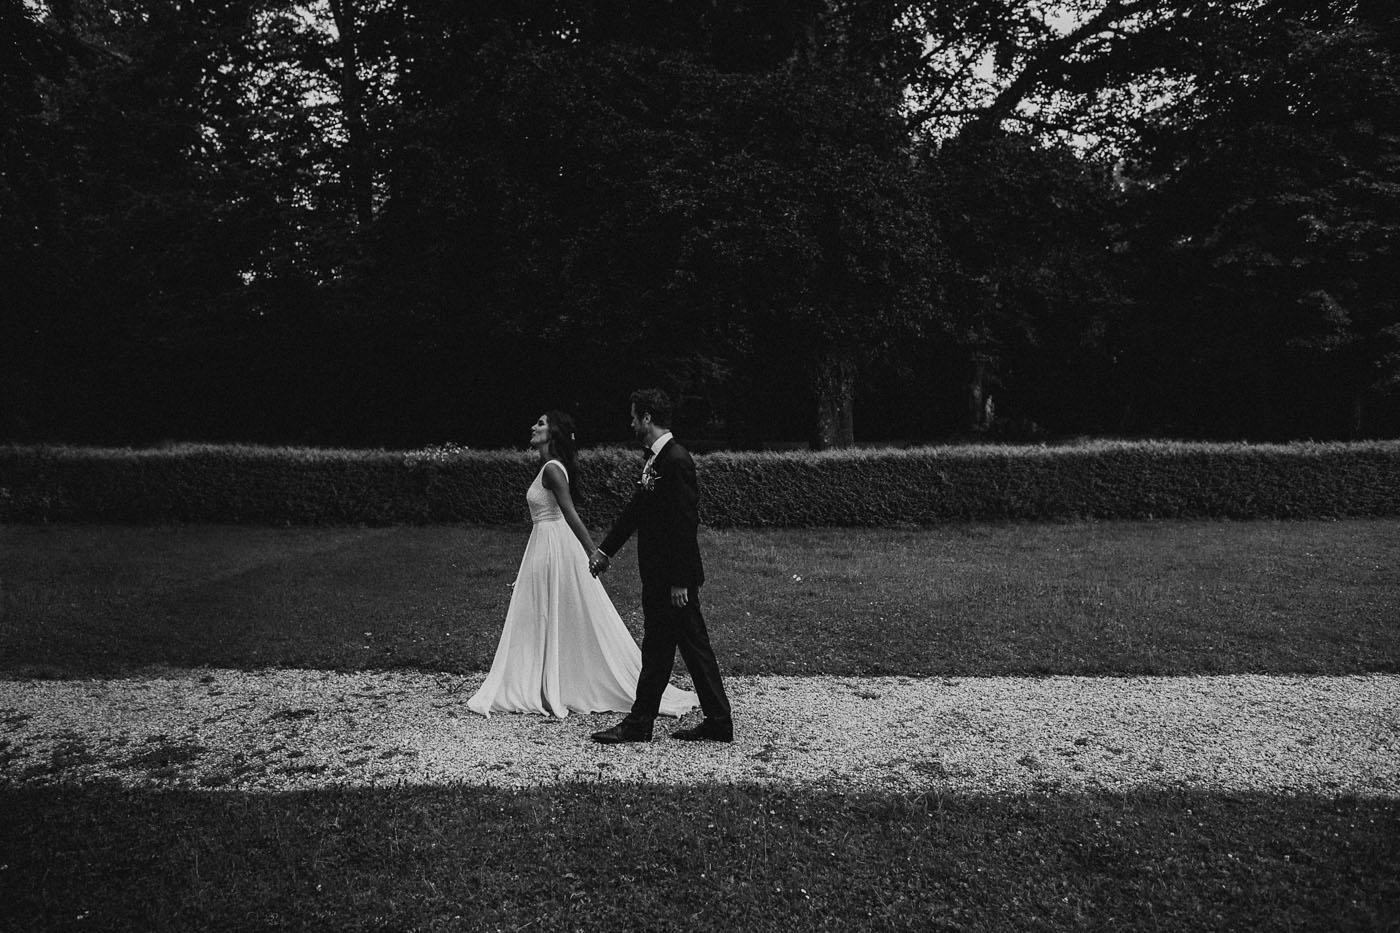 wedding-leopoldskron-photographer-33